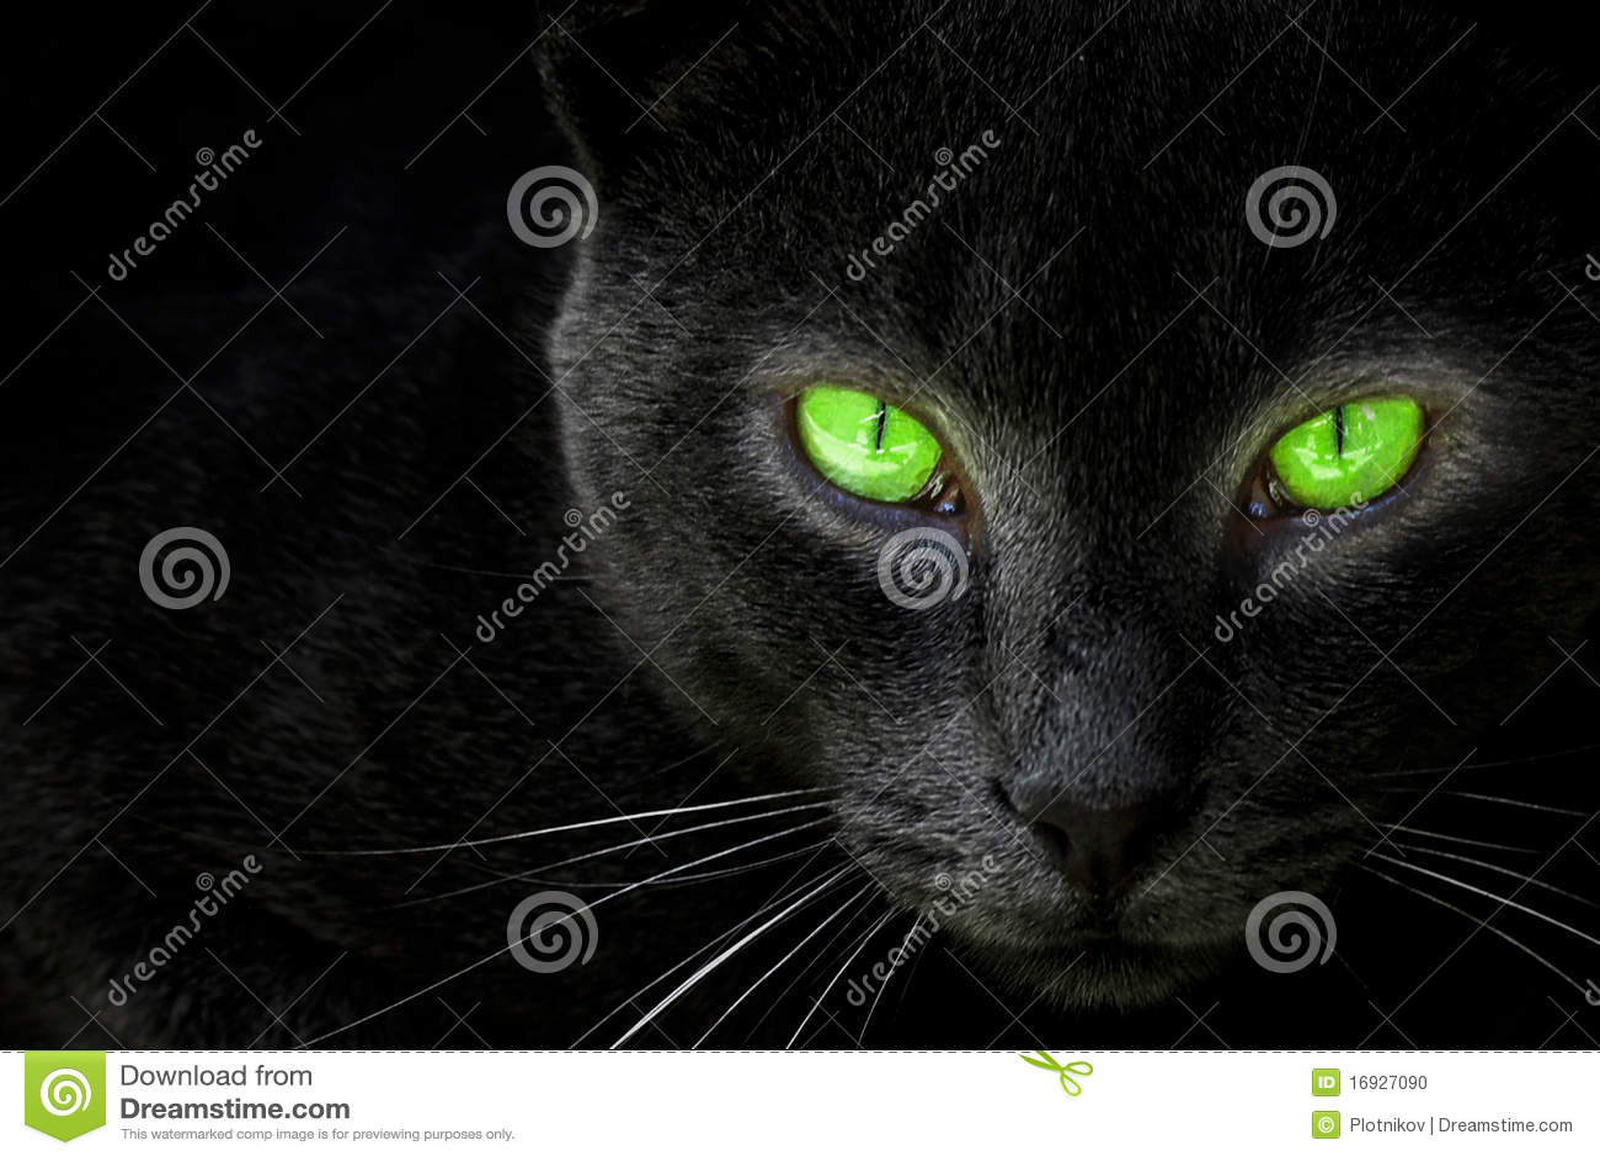 Black cat look in an lens.